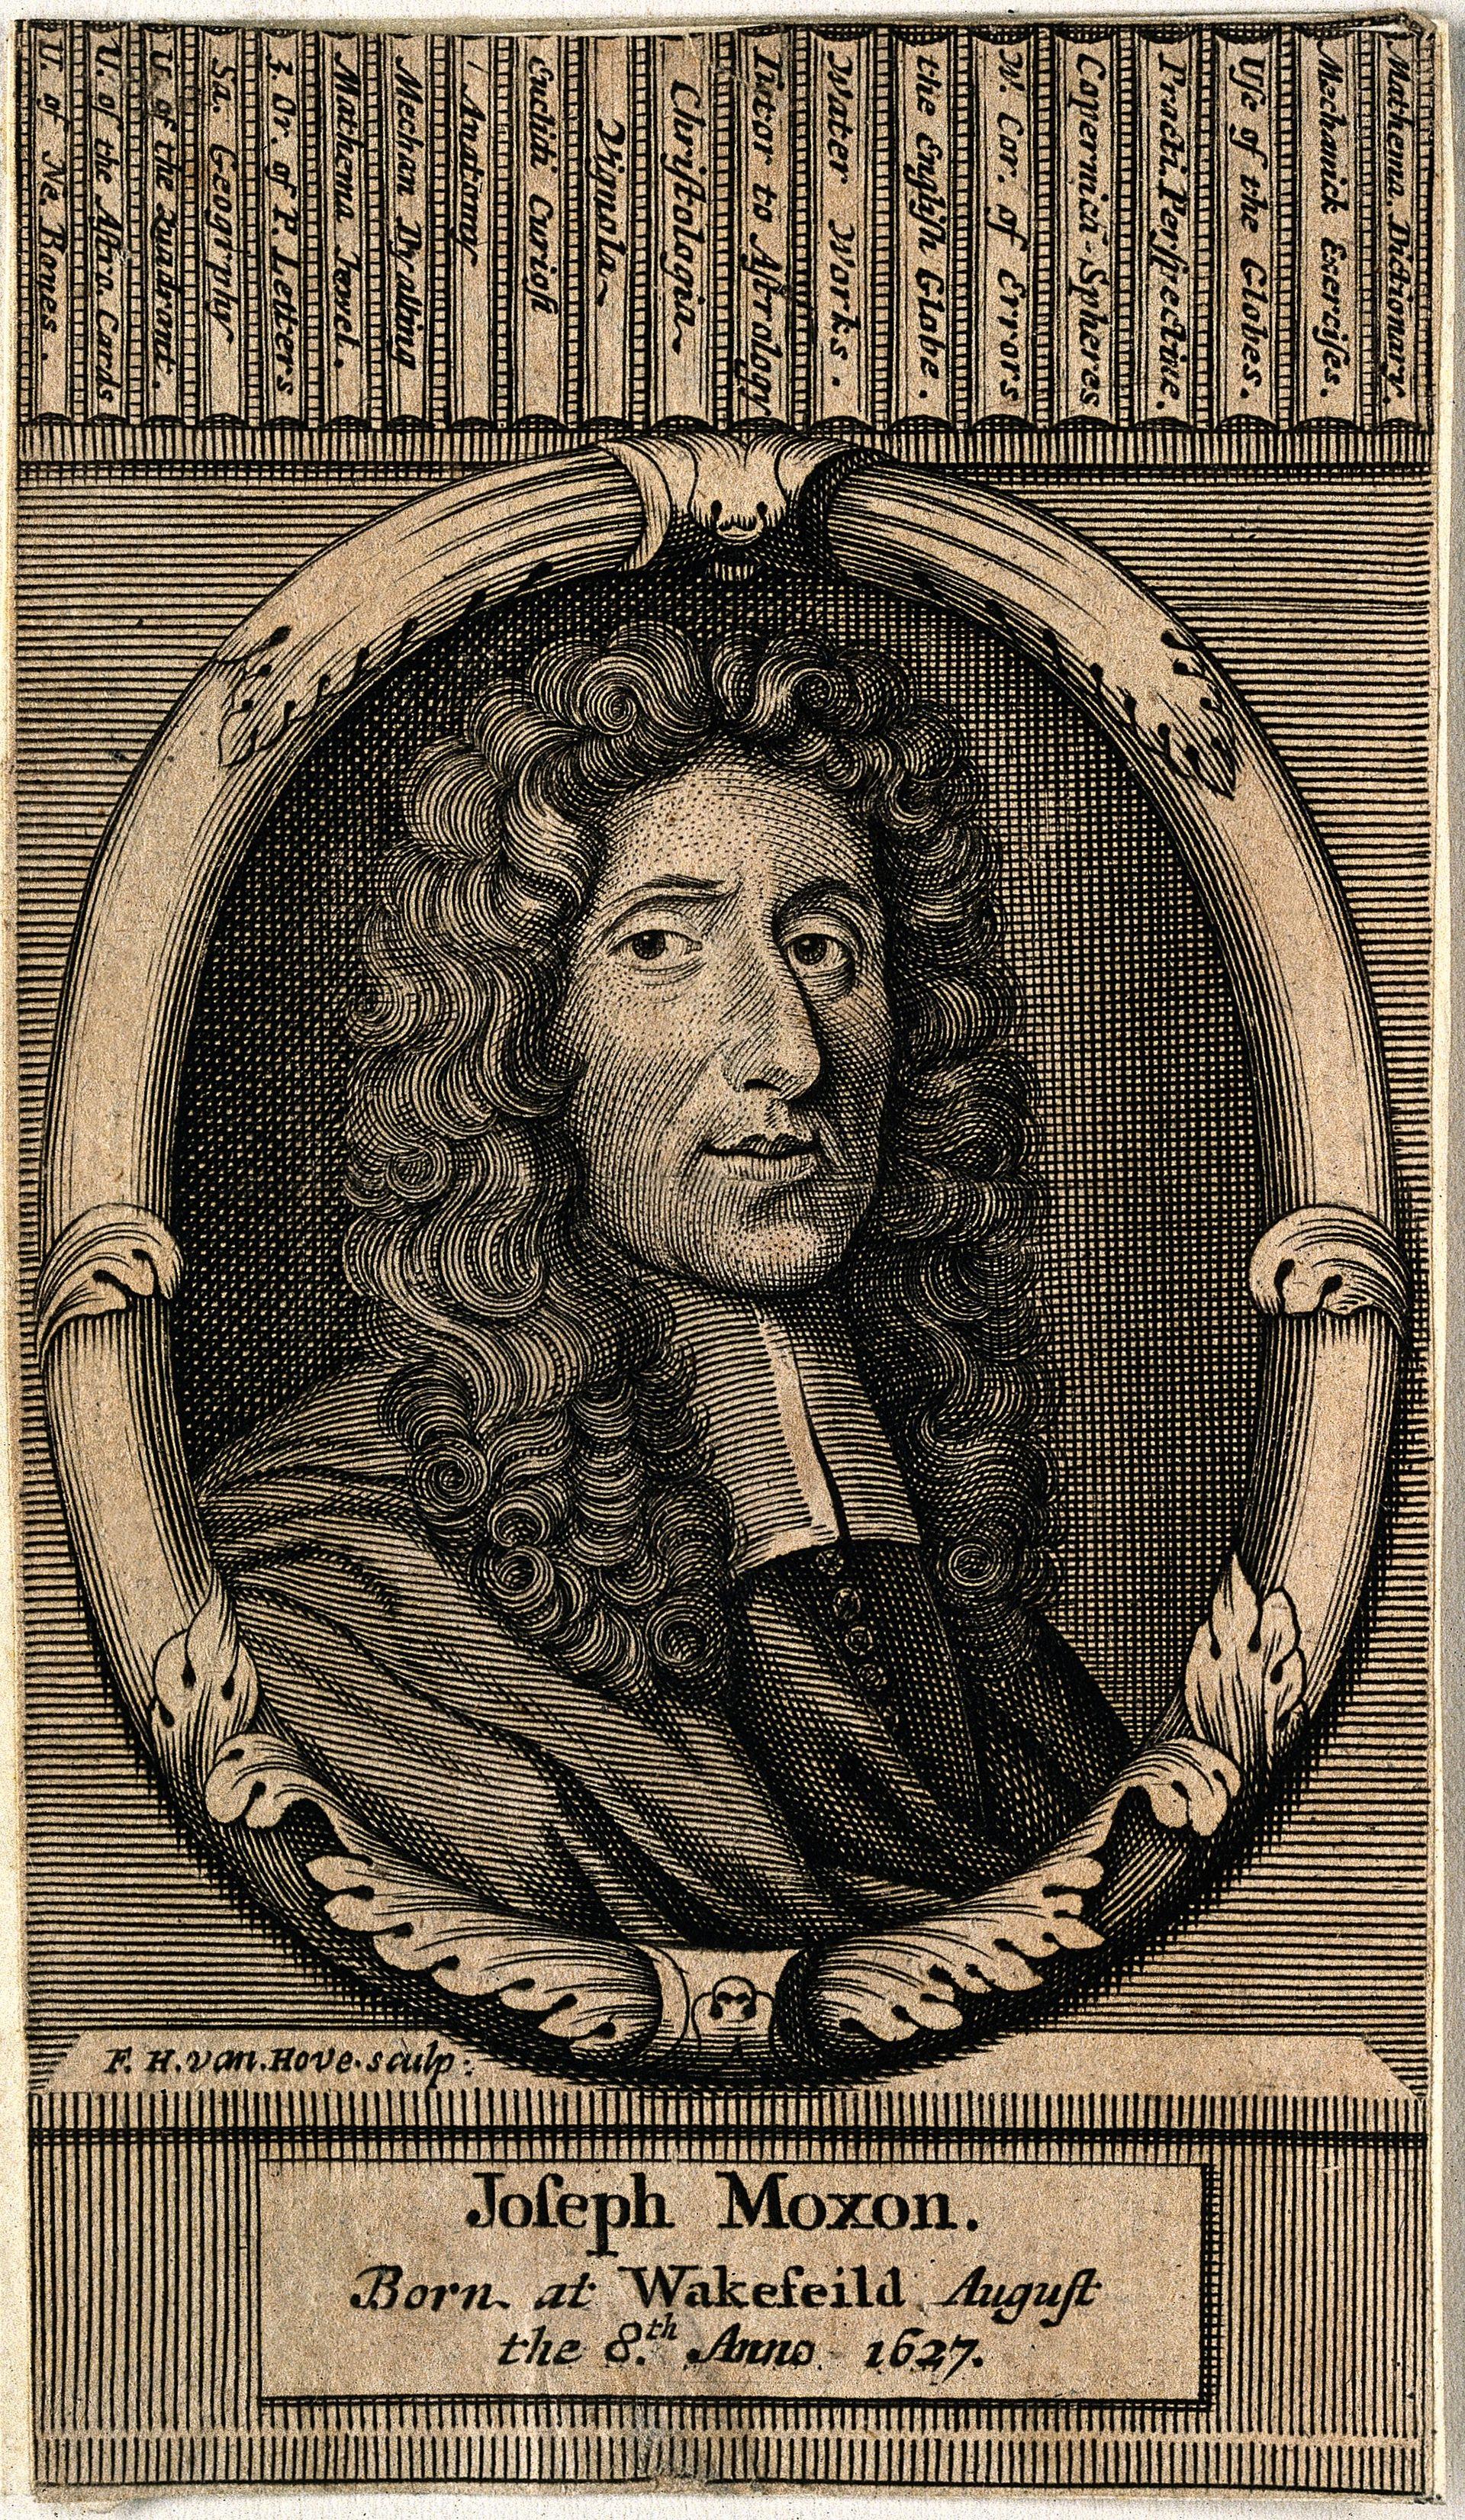 Joseph_Moxon._Line_engraving_by_F._H._van_Hove,_1692._Wellcome_V0004151